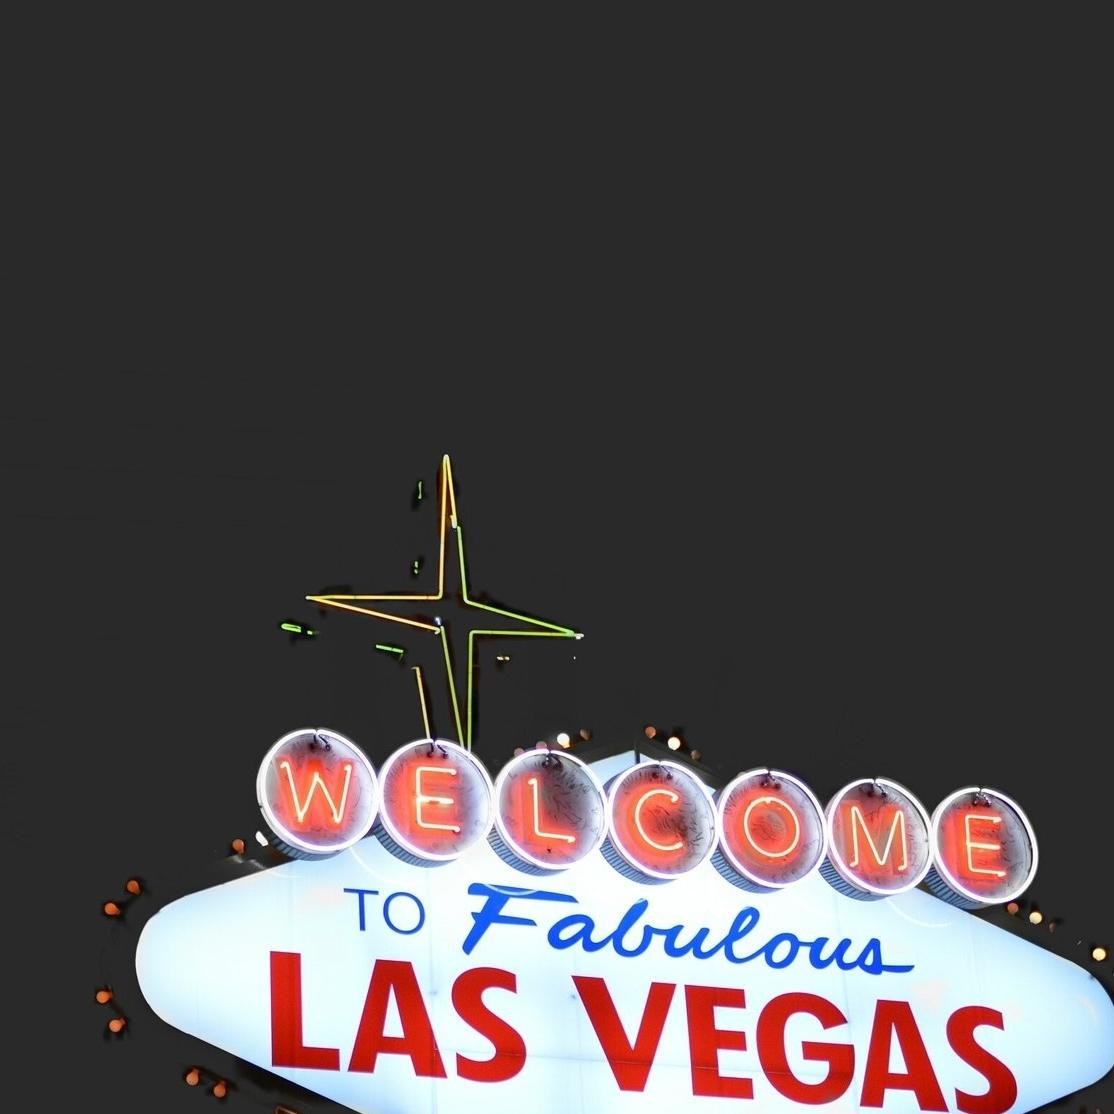 Day 1 - Las Vegas